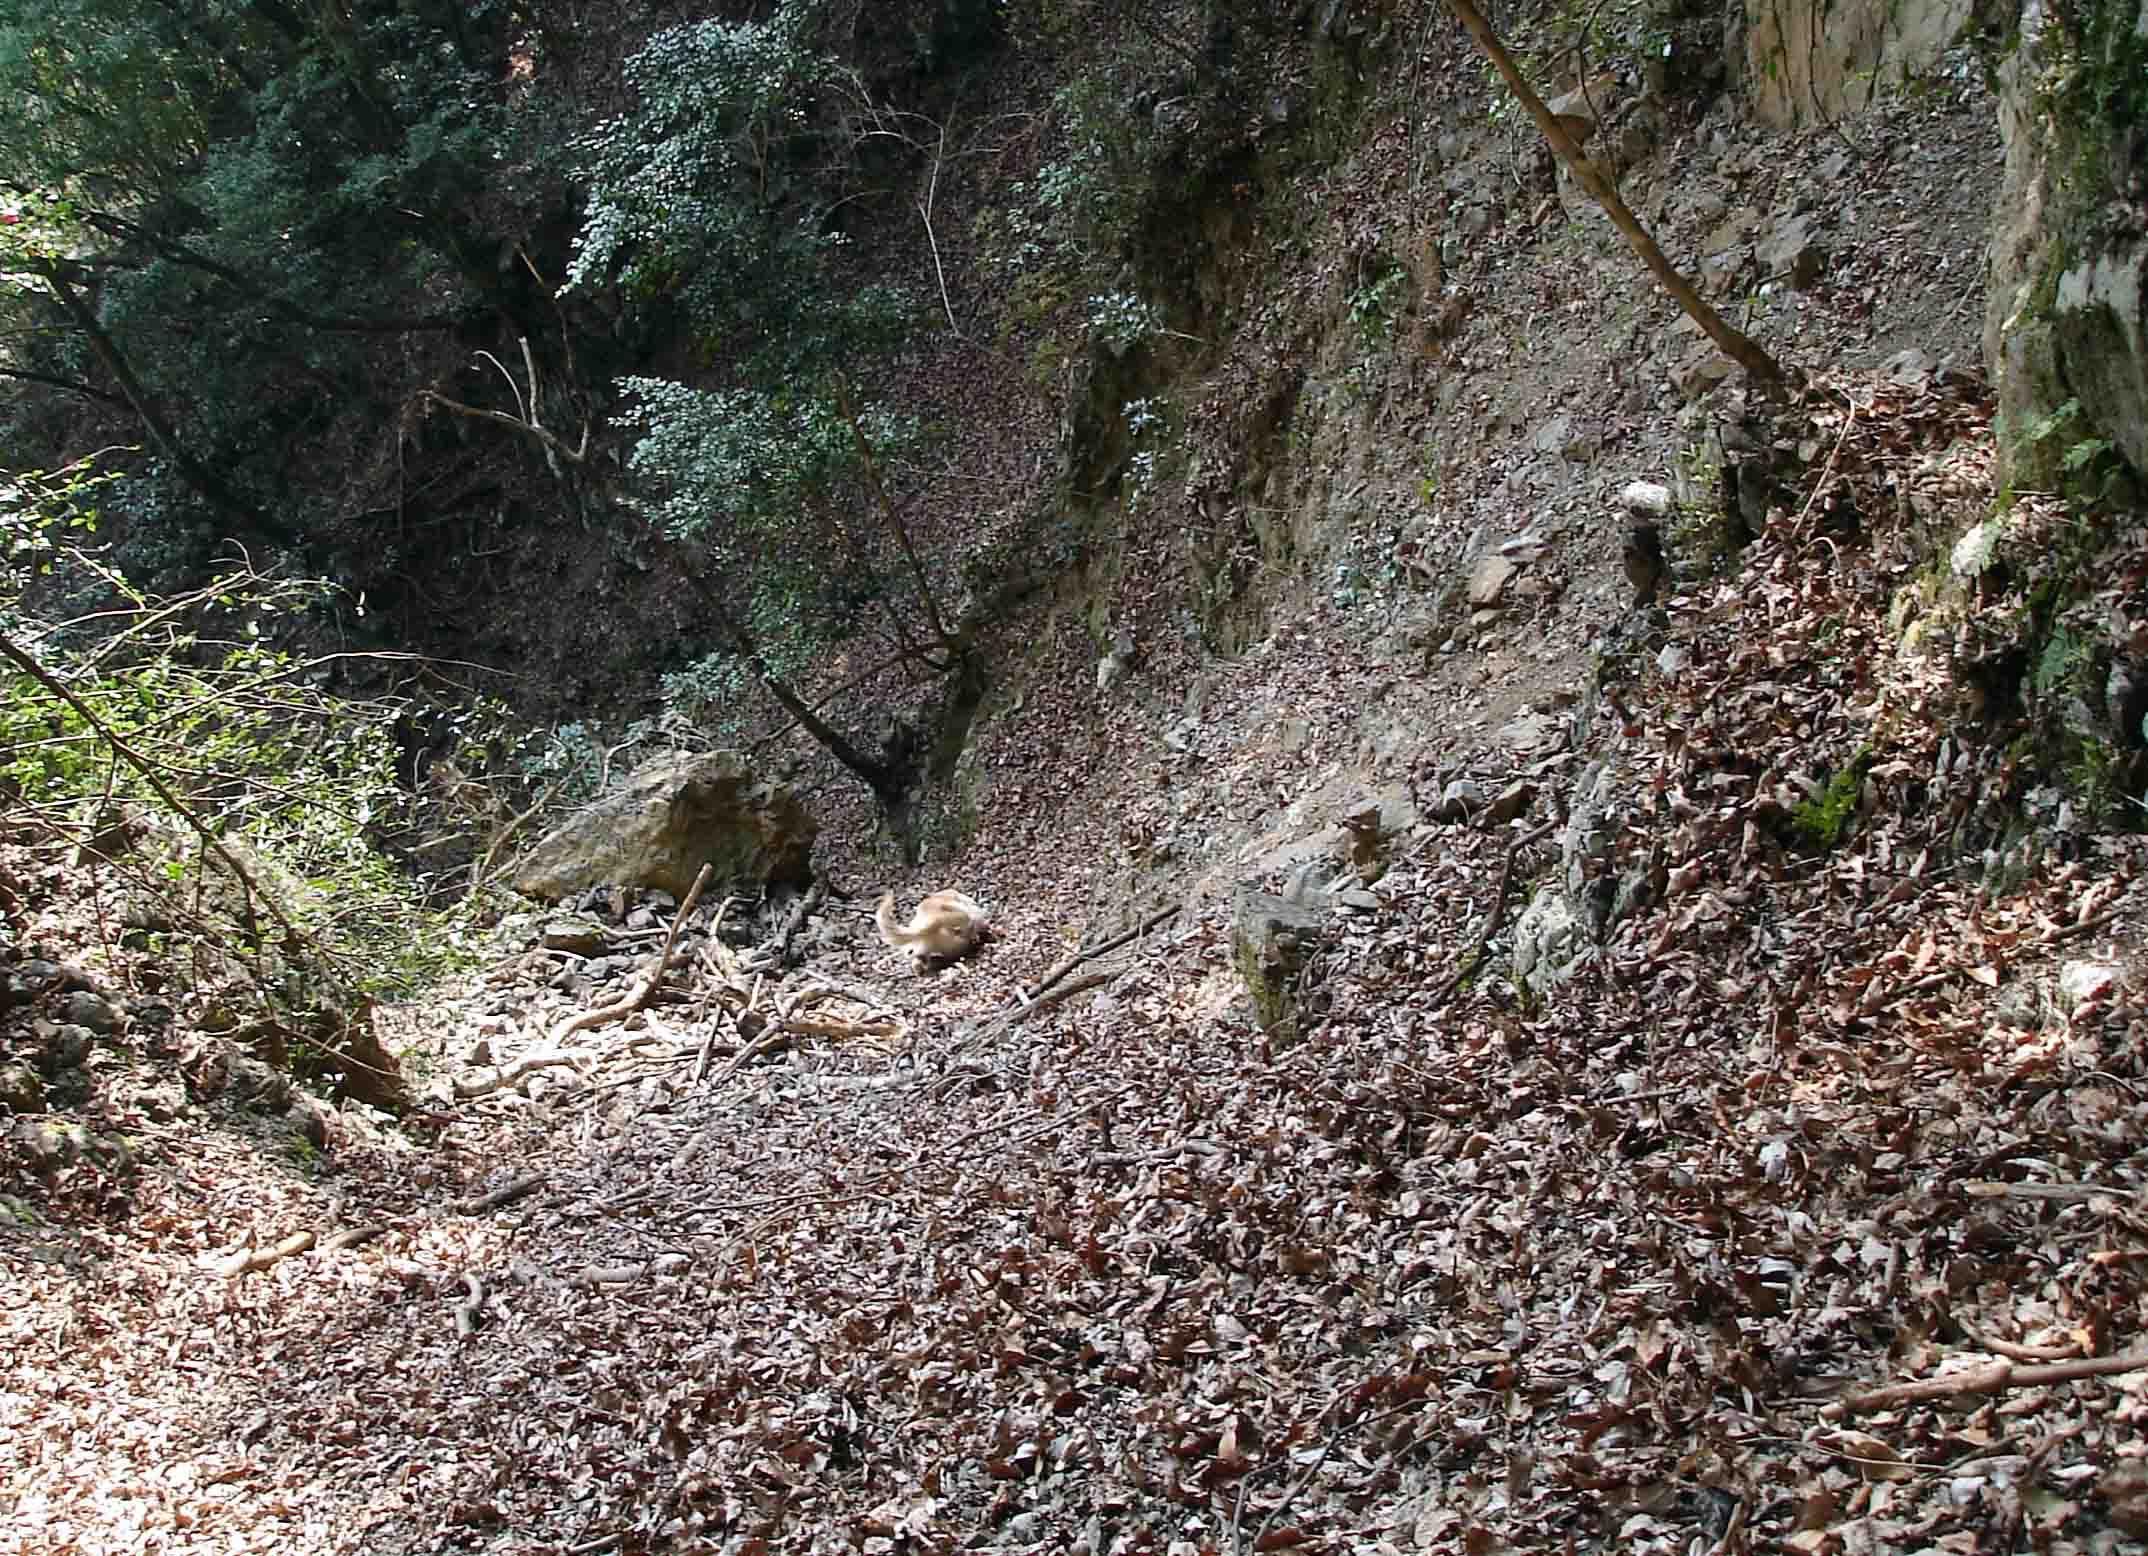 Dsc08426 堆積倒木付近を捜索するチャンス(二王山Ⅱ)